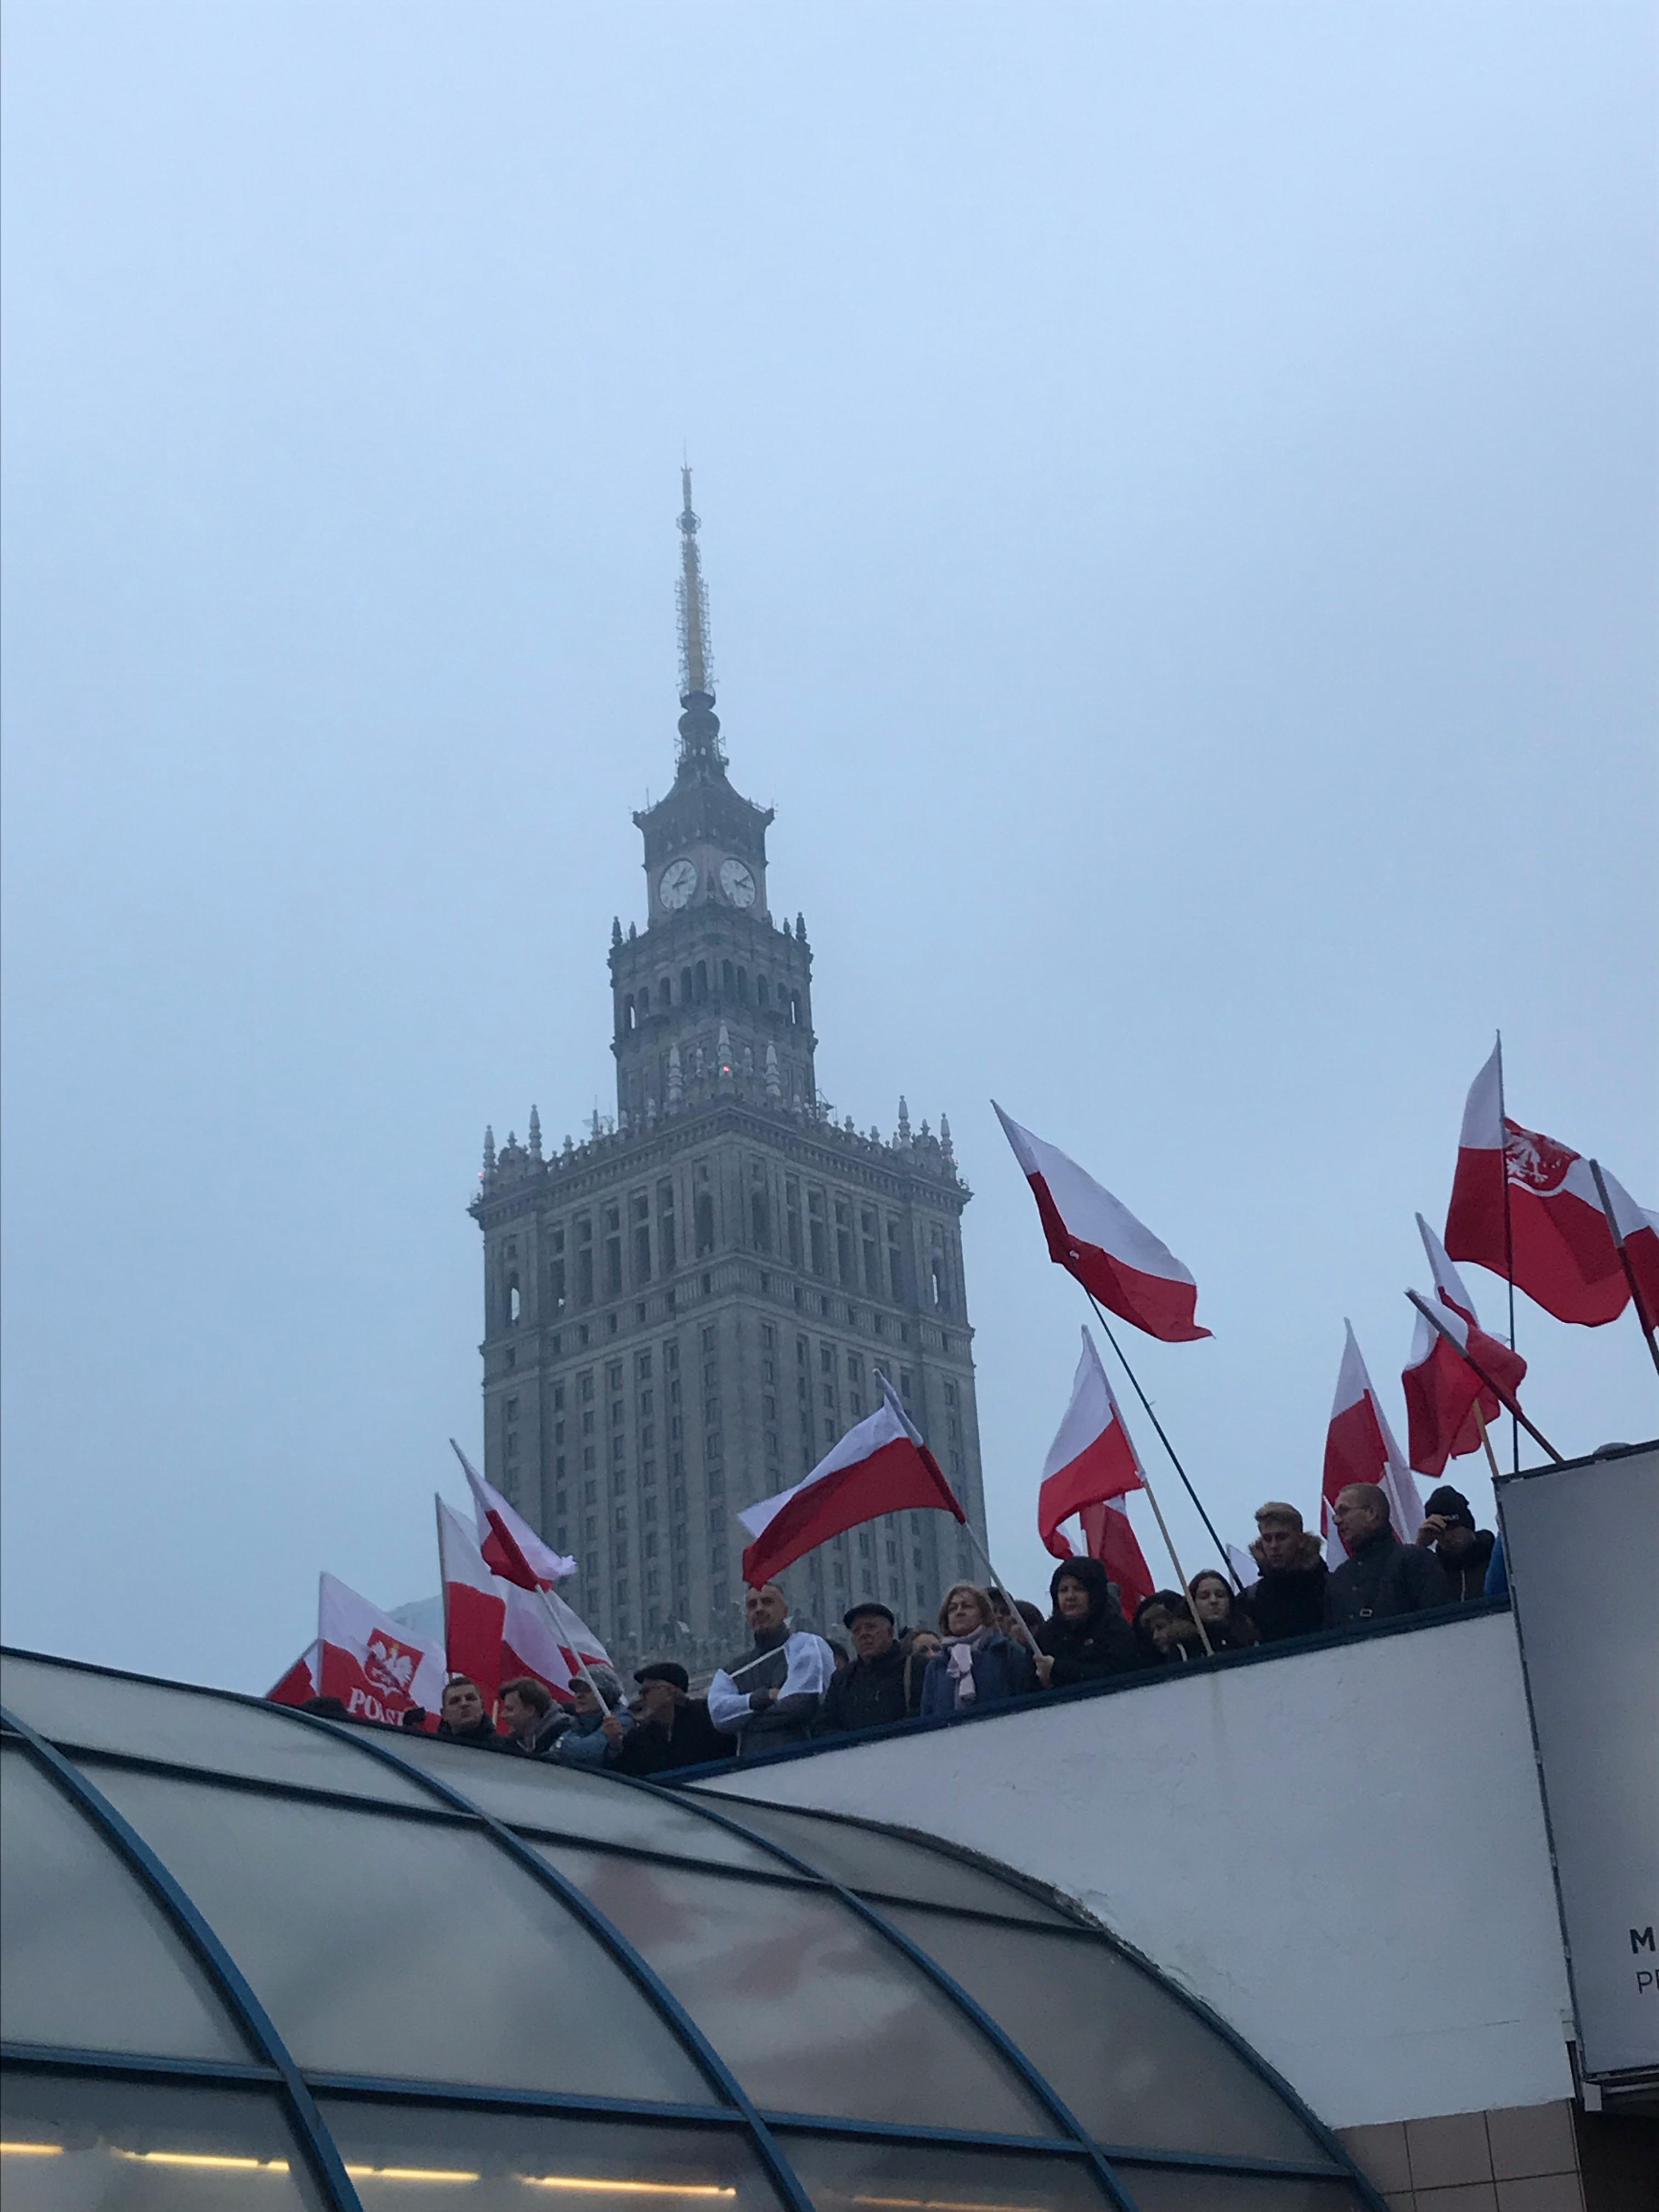 Varšavou prošel pochod nezávislosti na oslavu sto let samostatnosti Polska